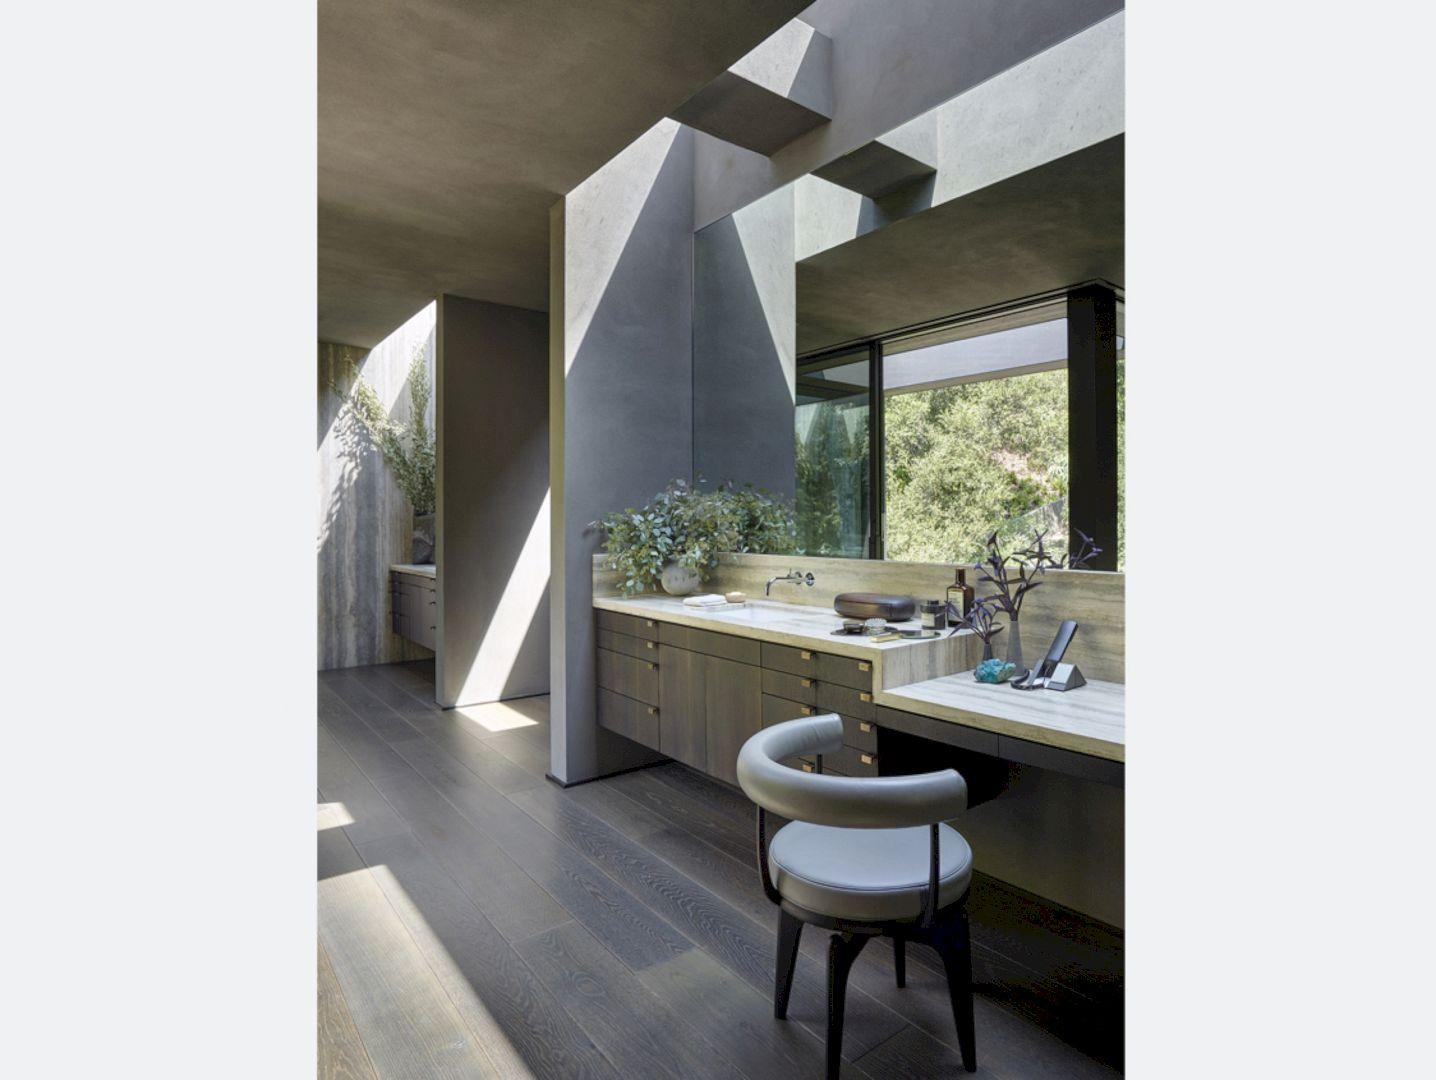 Mandeville Canyon By Marmol Radziner Architecture 1